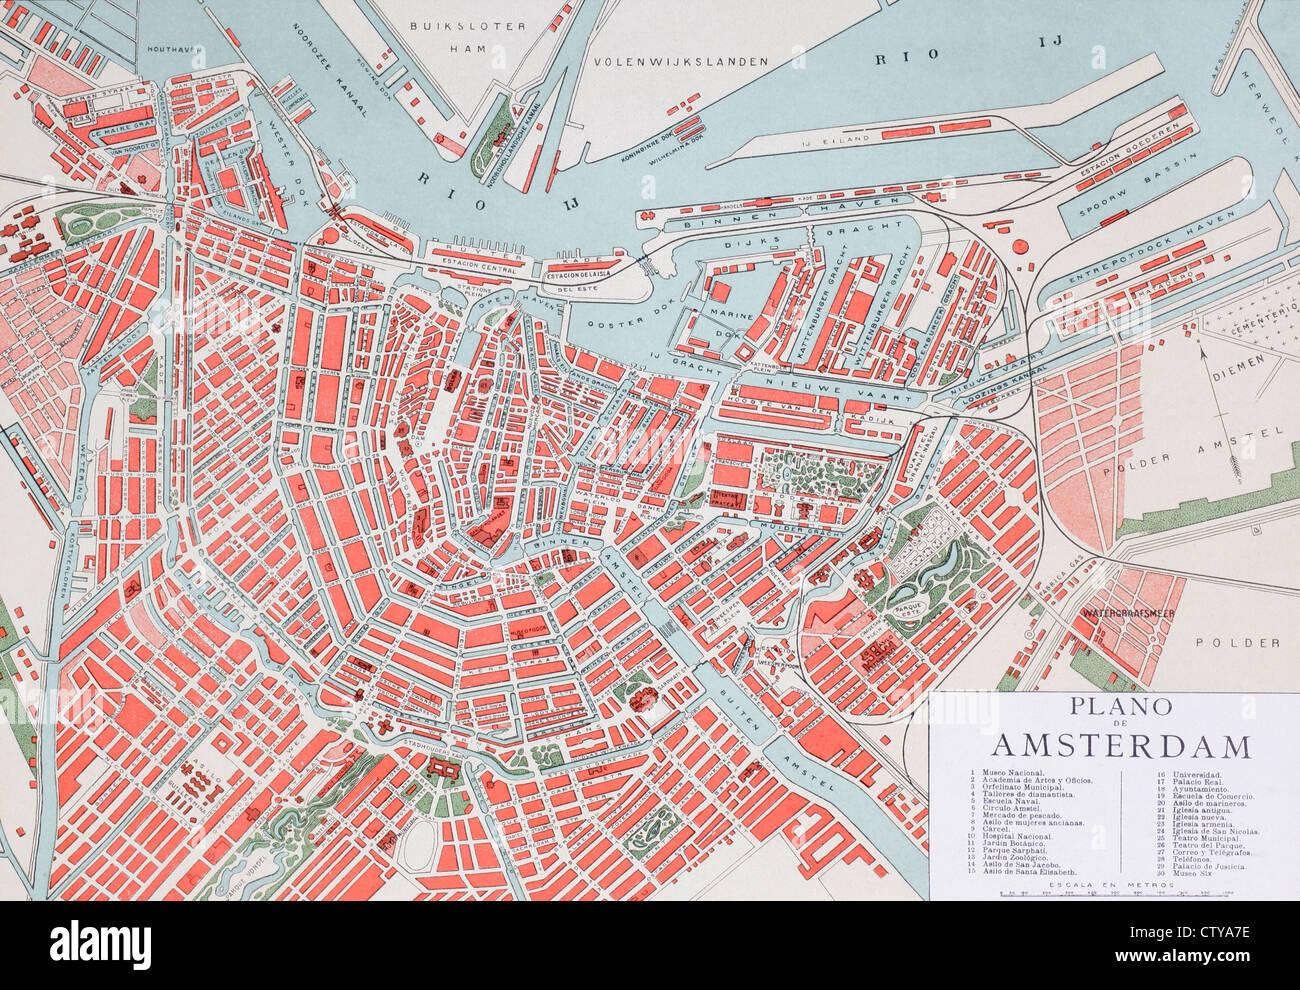 Plan de Ámsterdam, Holanda, a finales del siglo XX. Mapa editado en idioma español. Imagen De Stock